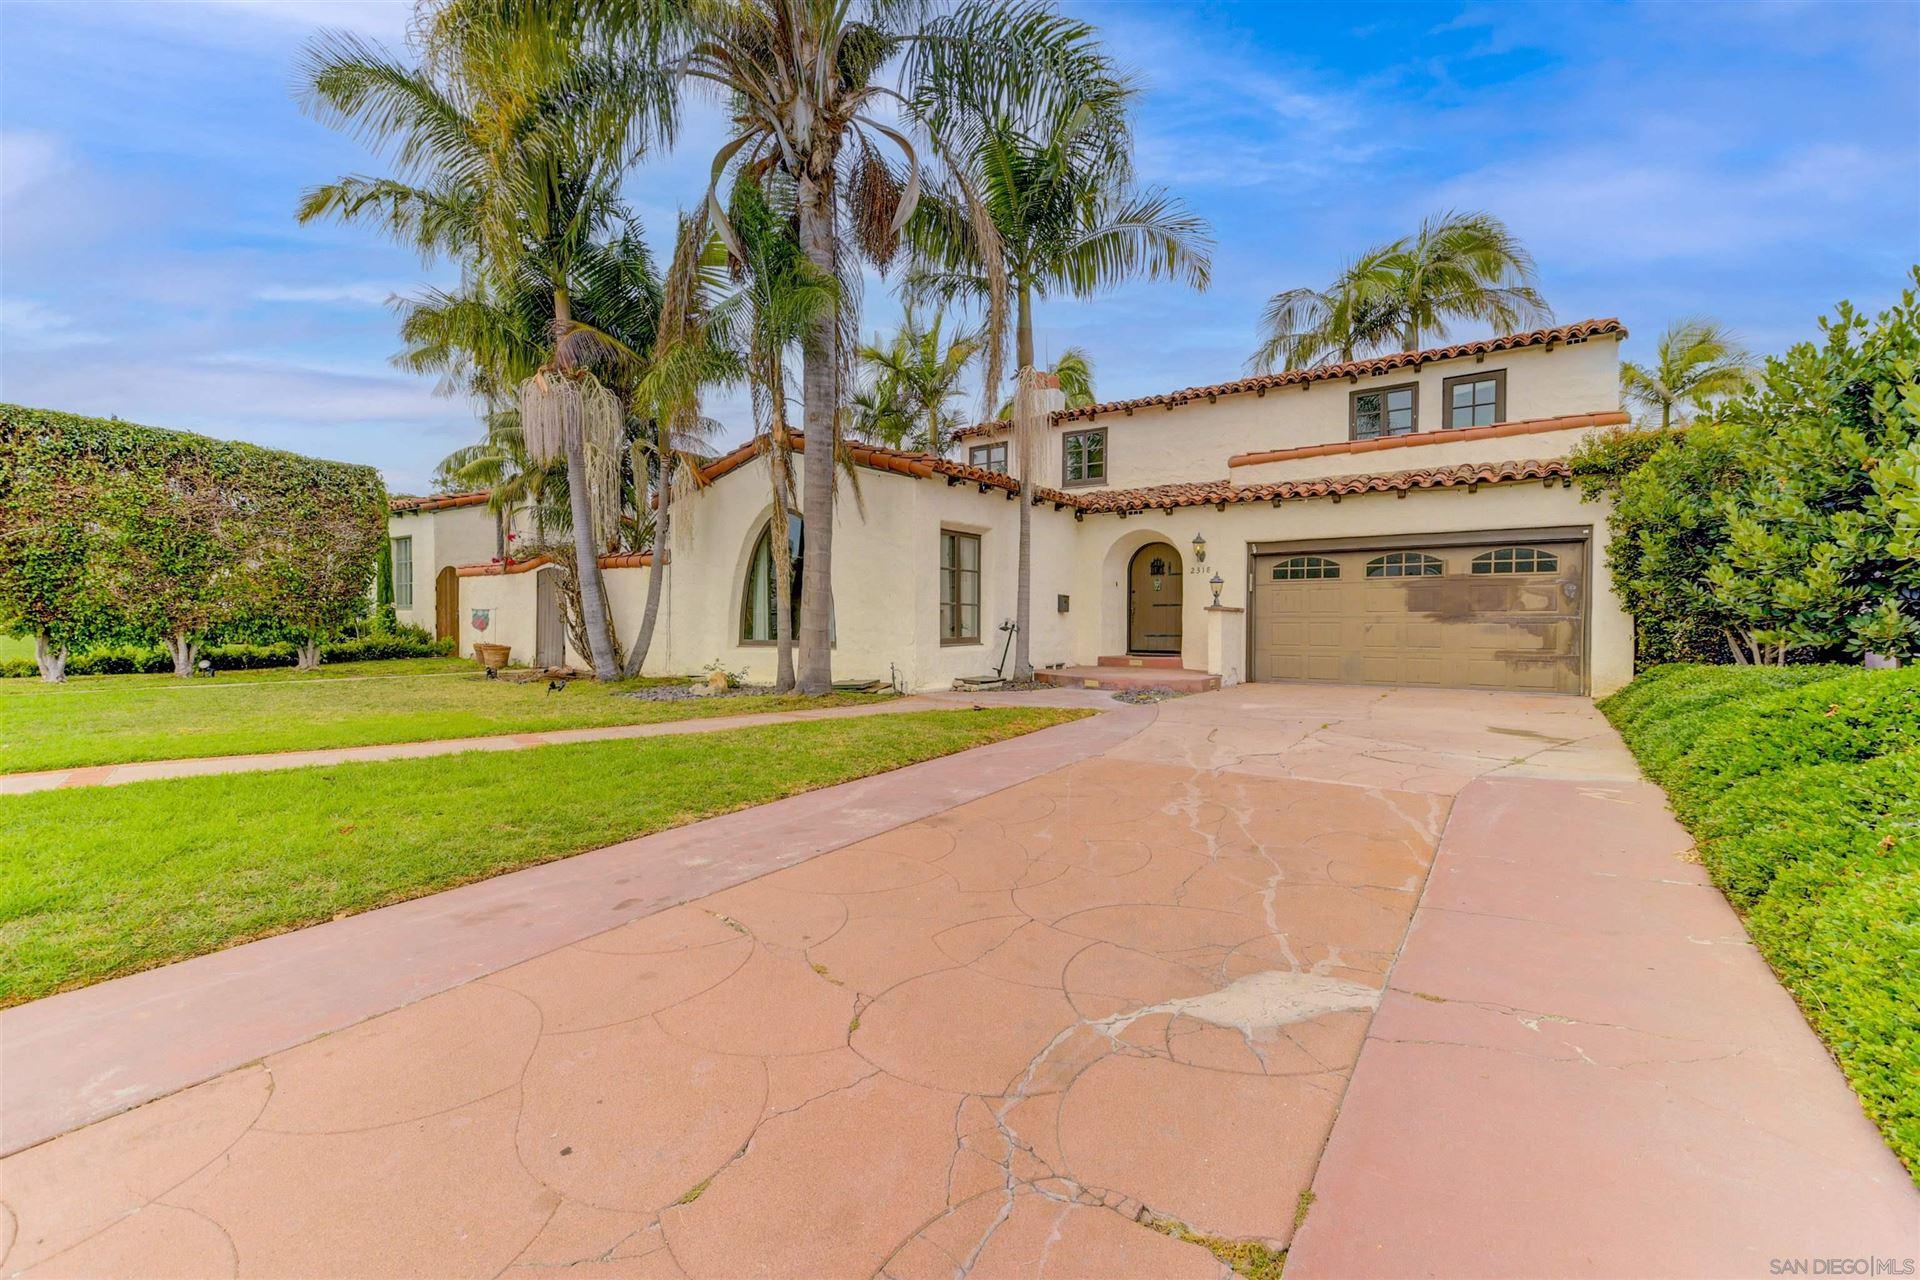 Photo of 2318 Plum Street, San Diego, CA 92106 (MLS # 210029756)